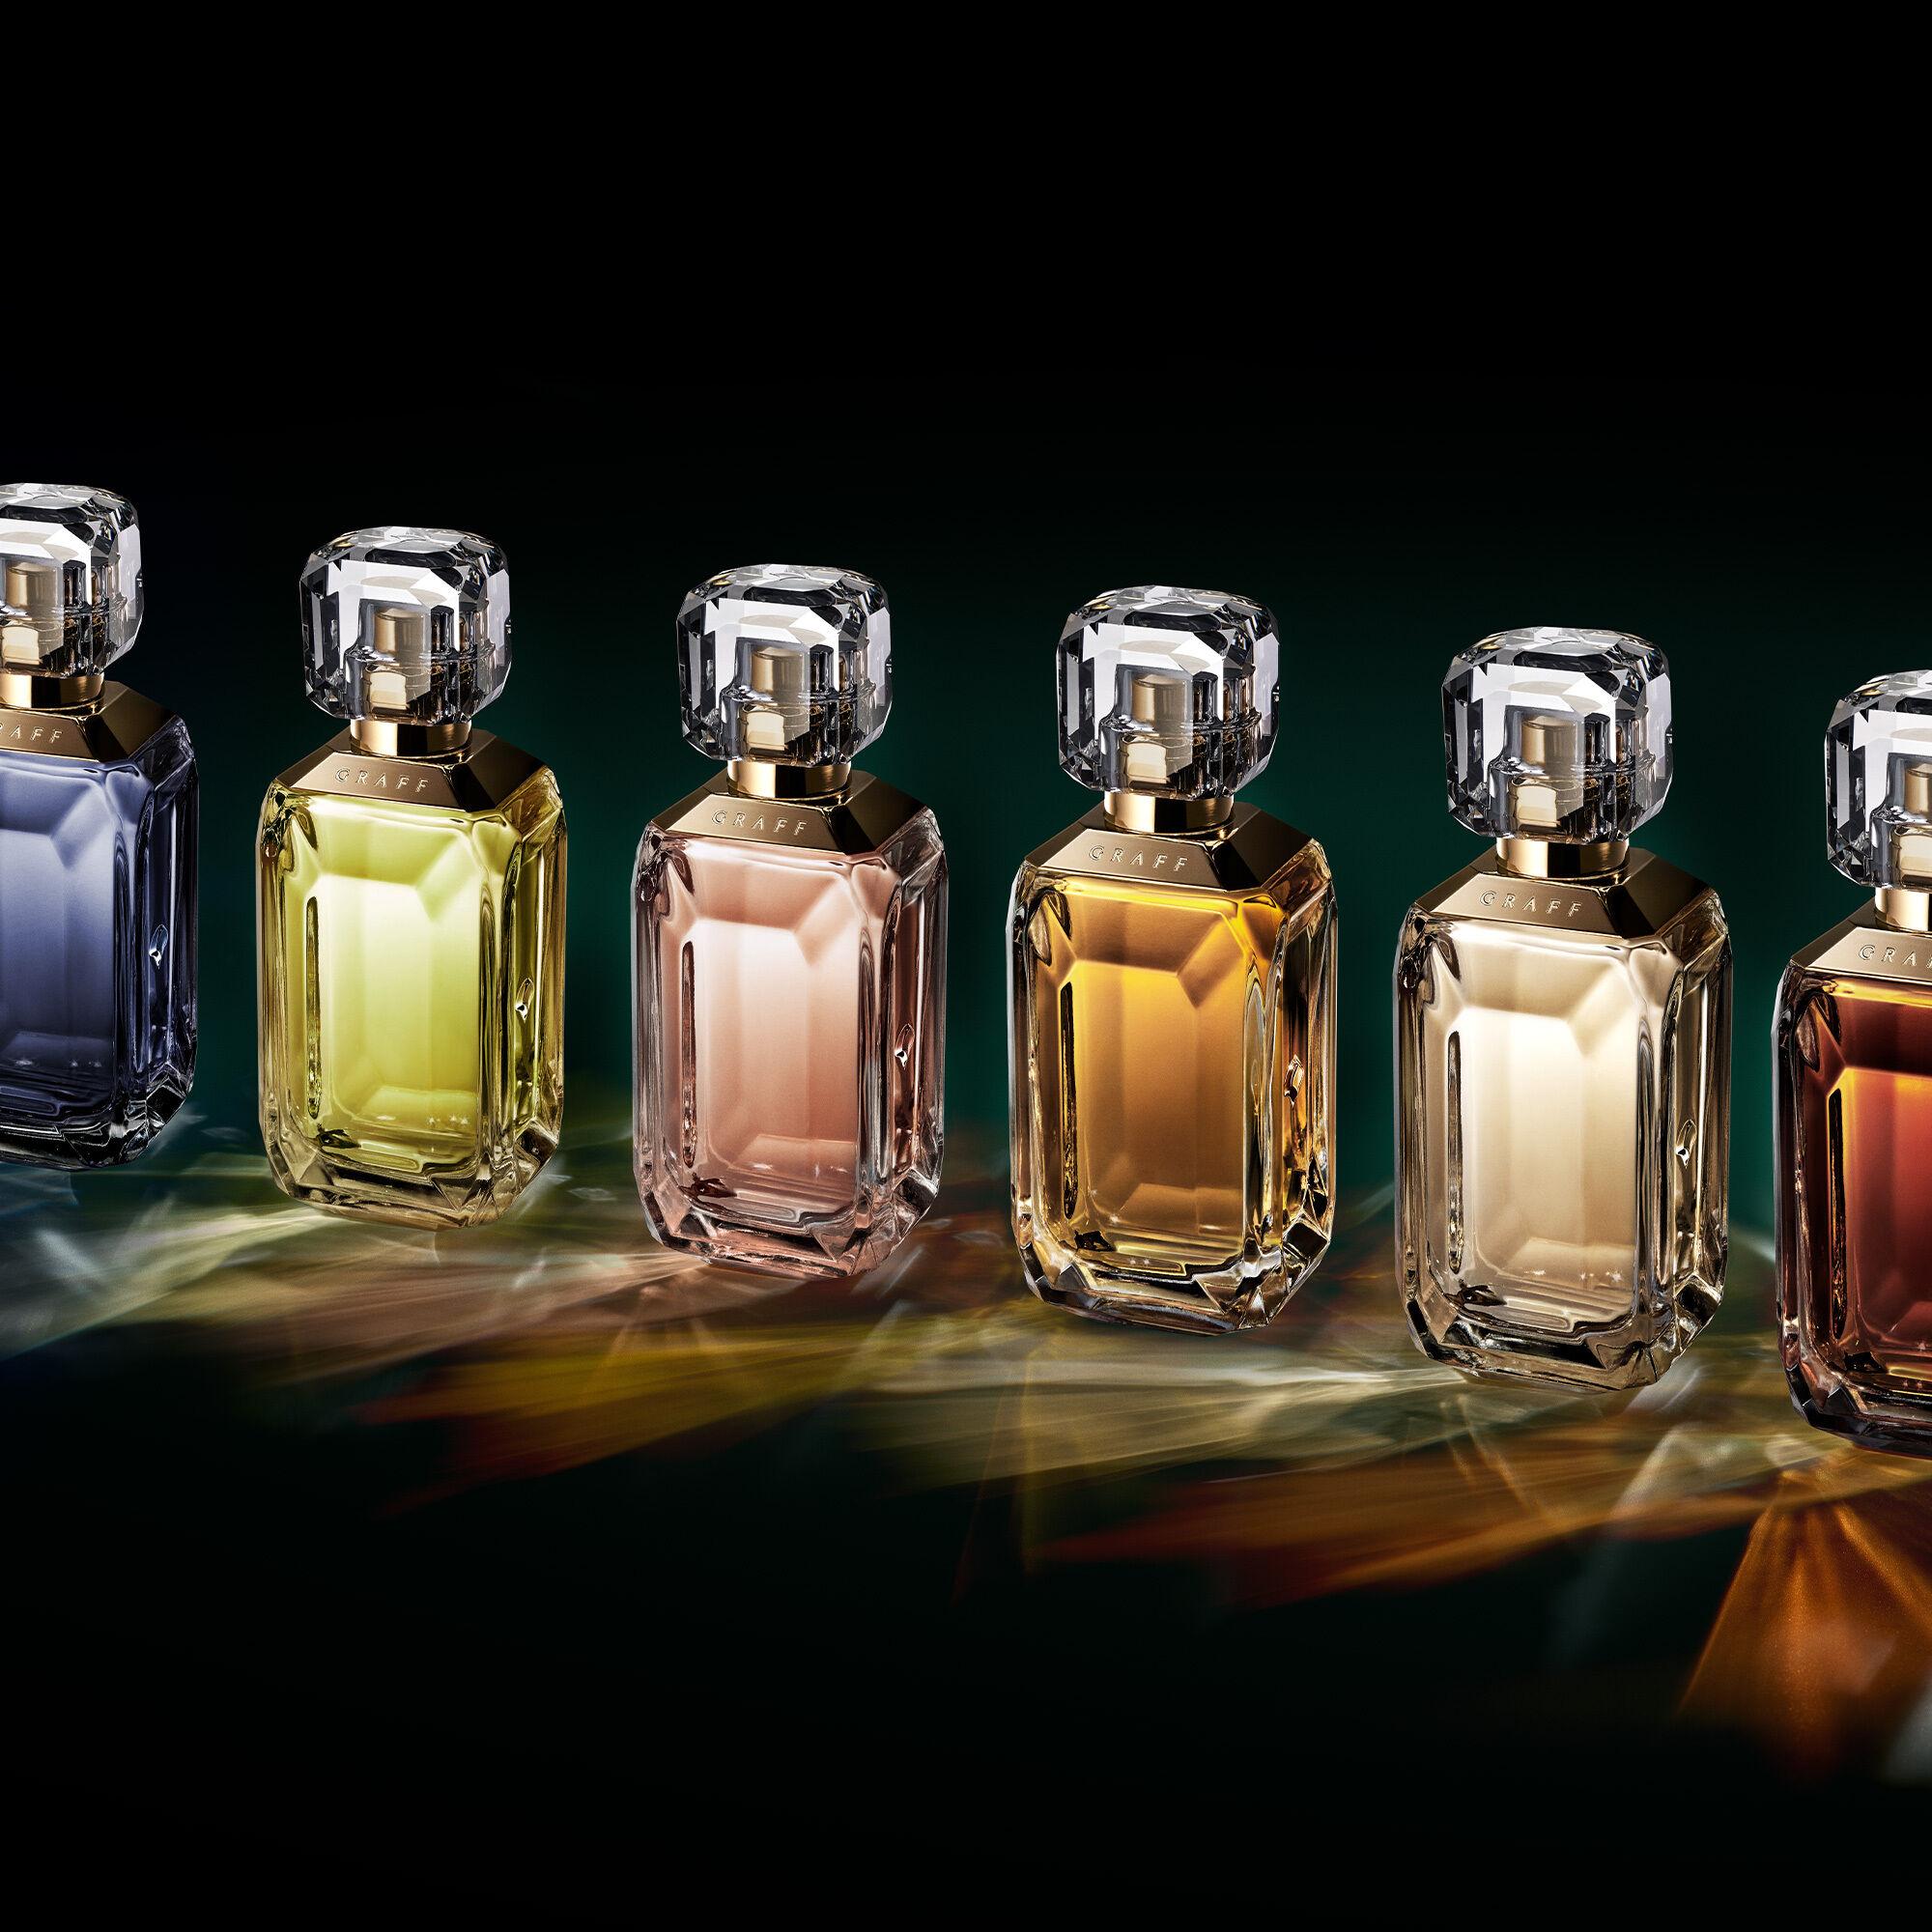 The Lesedi La Rona Fragrance